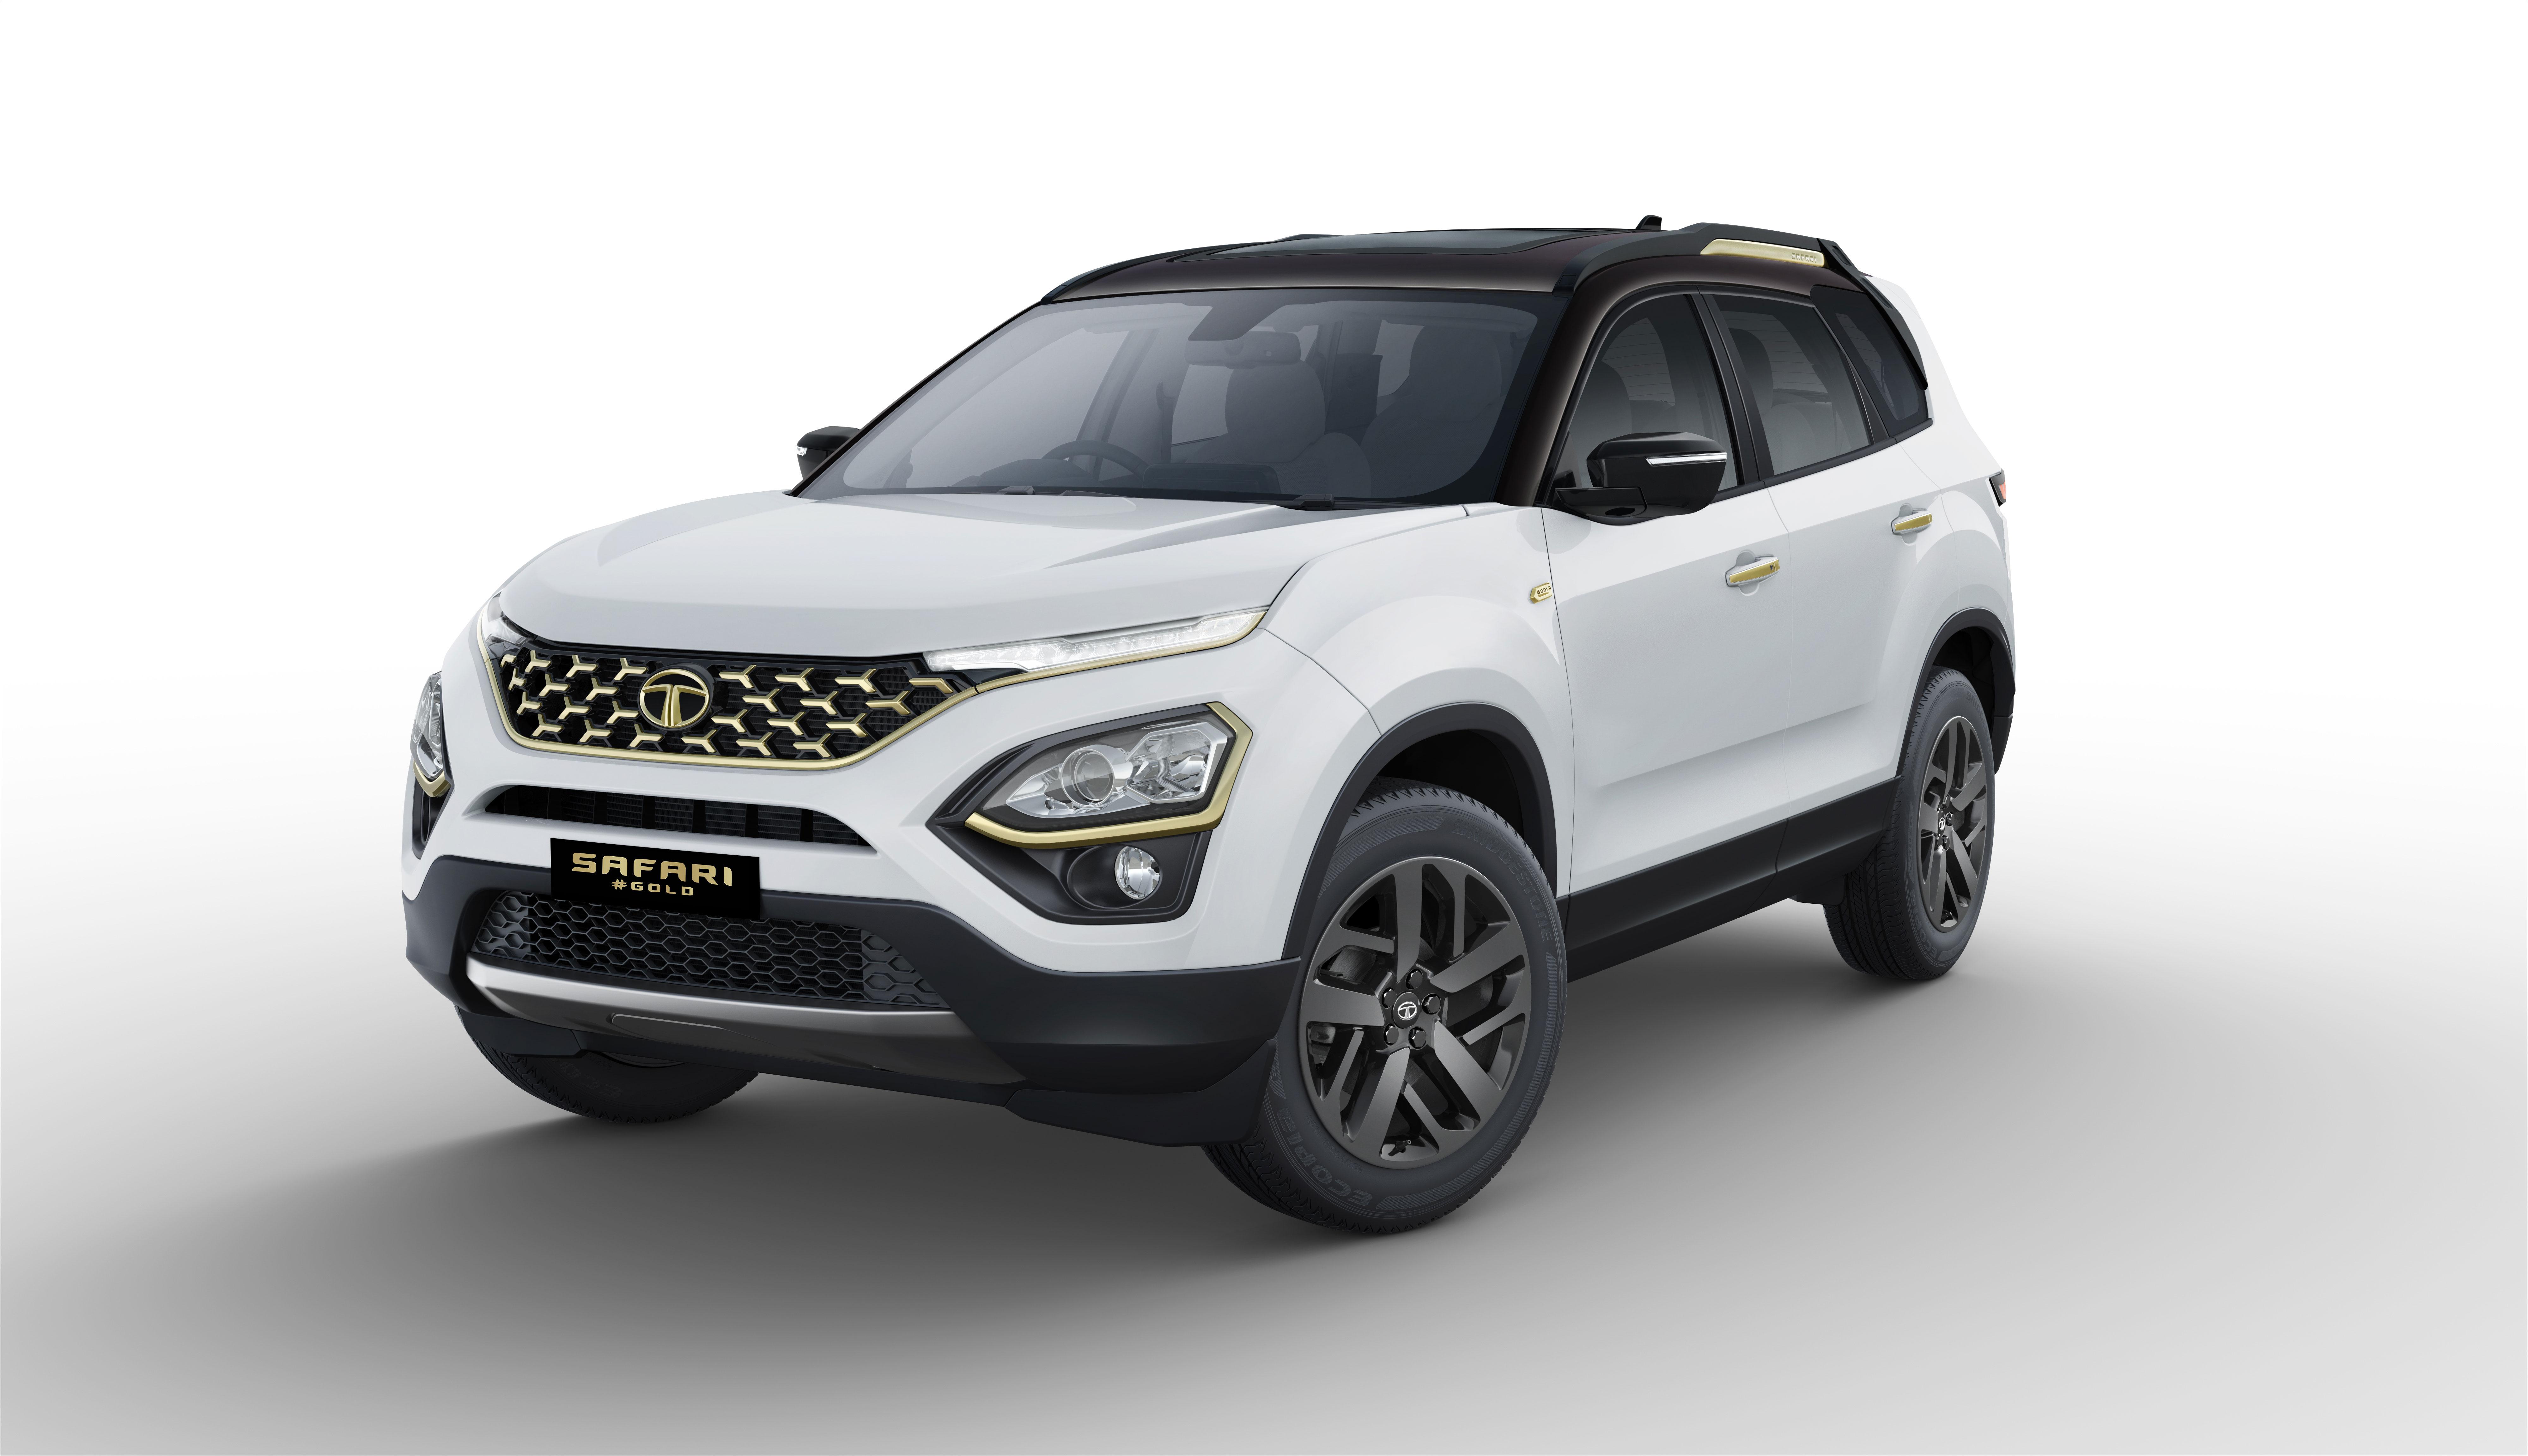 Tata Safari Gold three fourth front